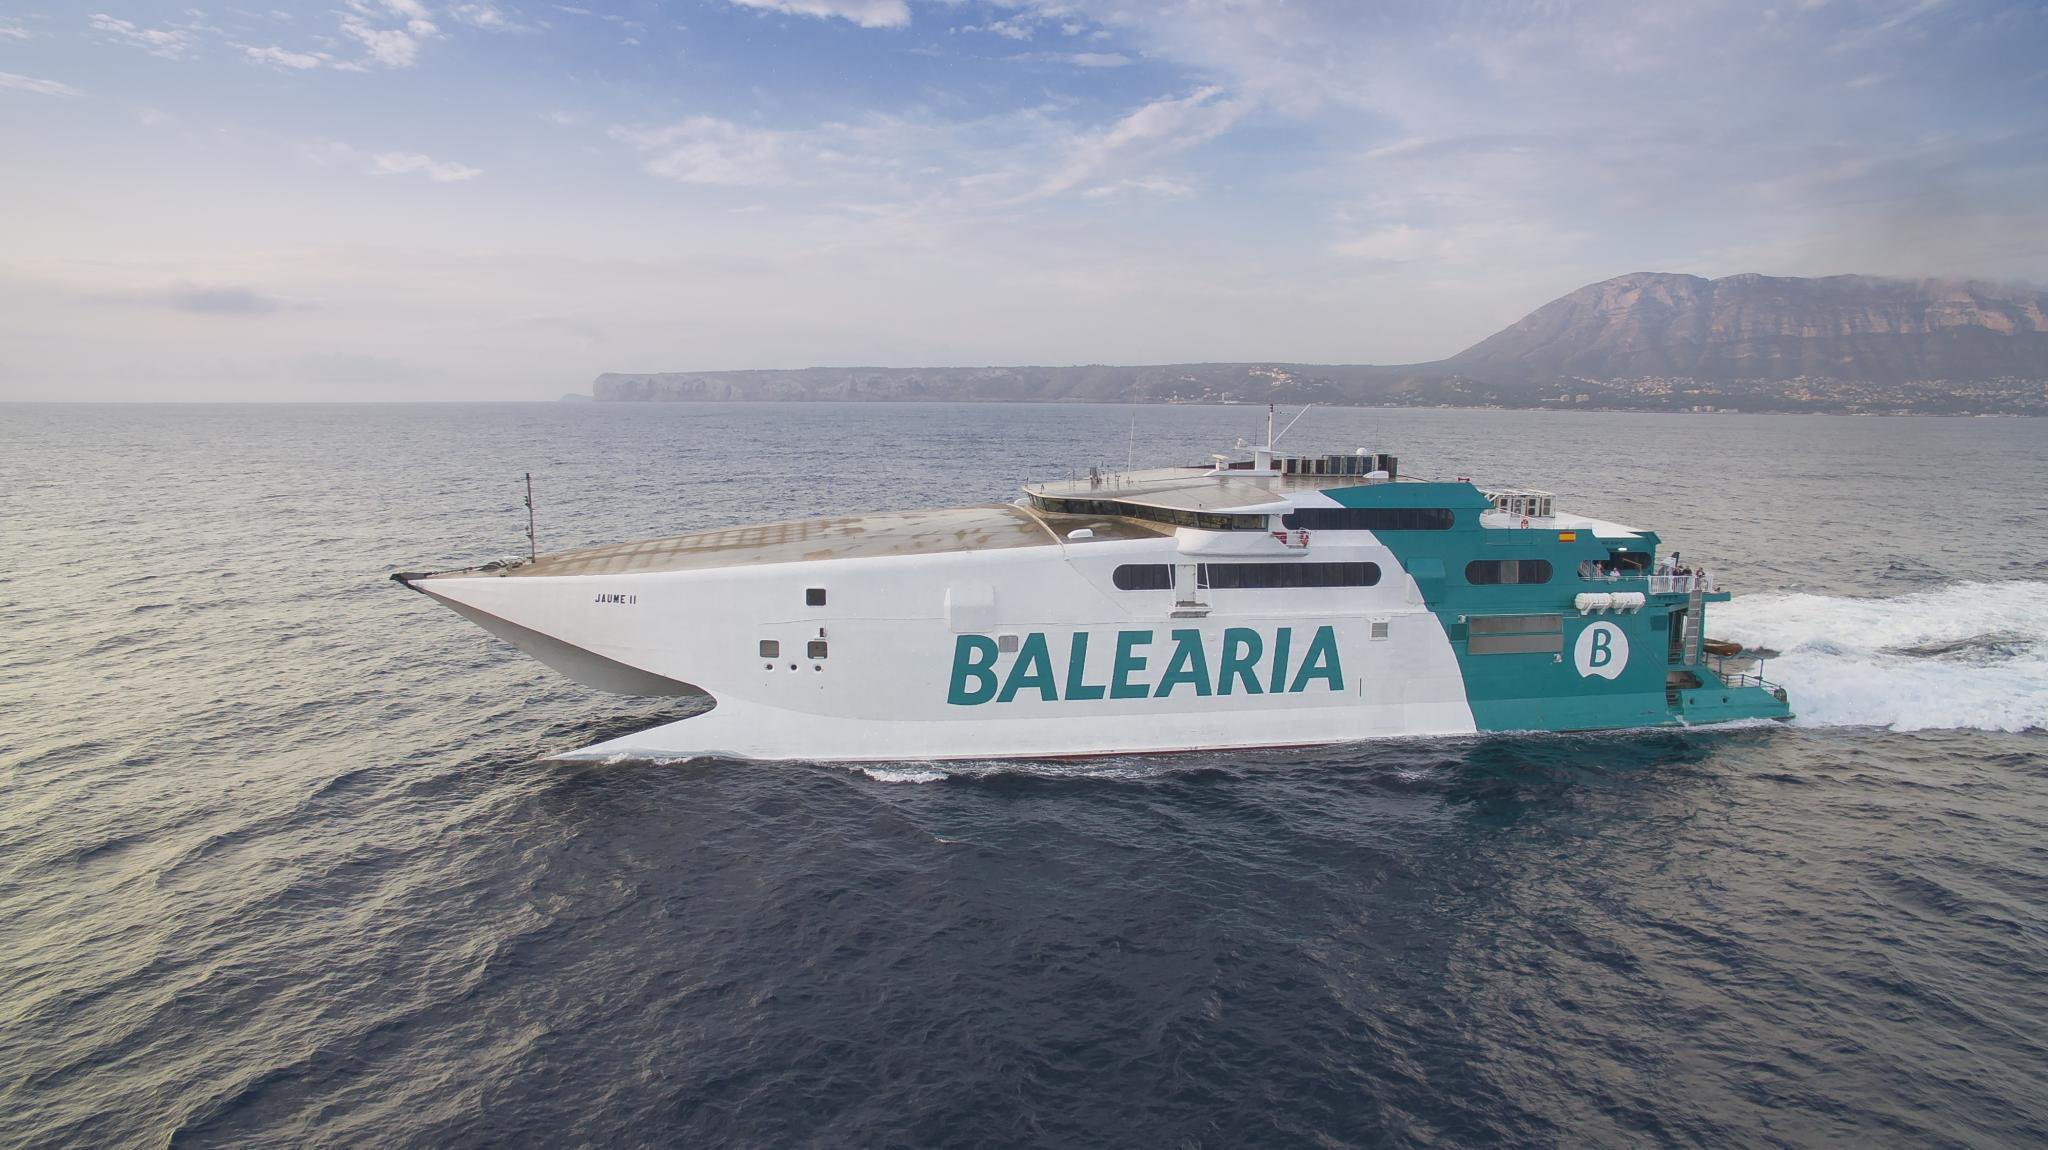 Jaume II - Reederei Baleària